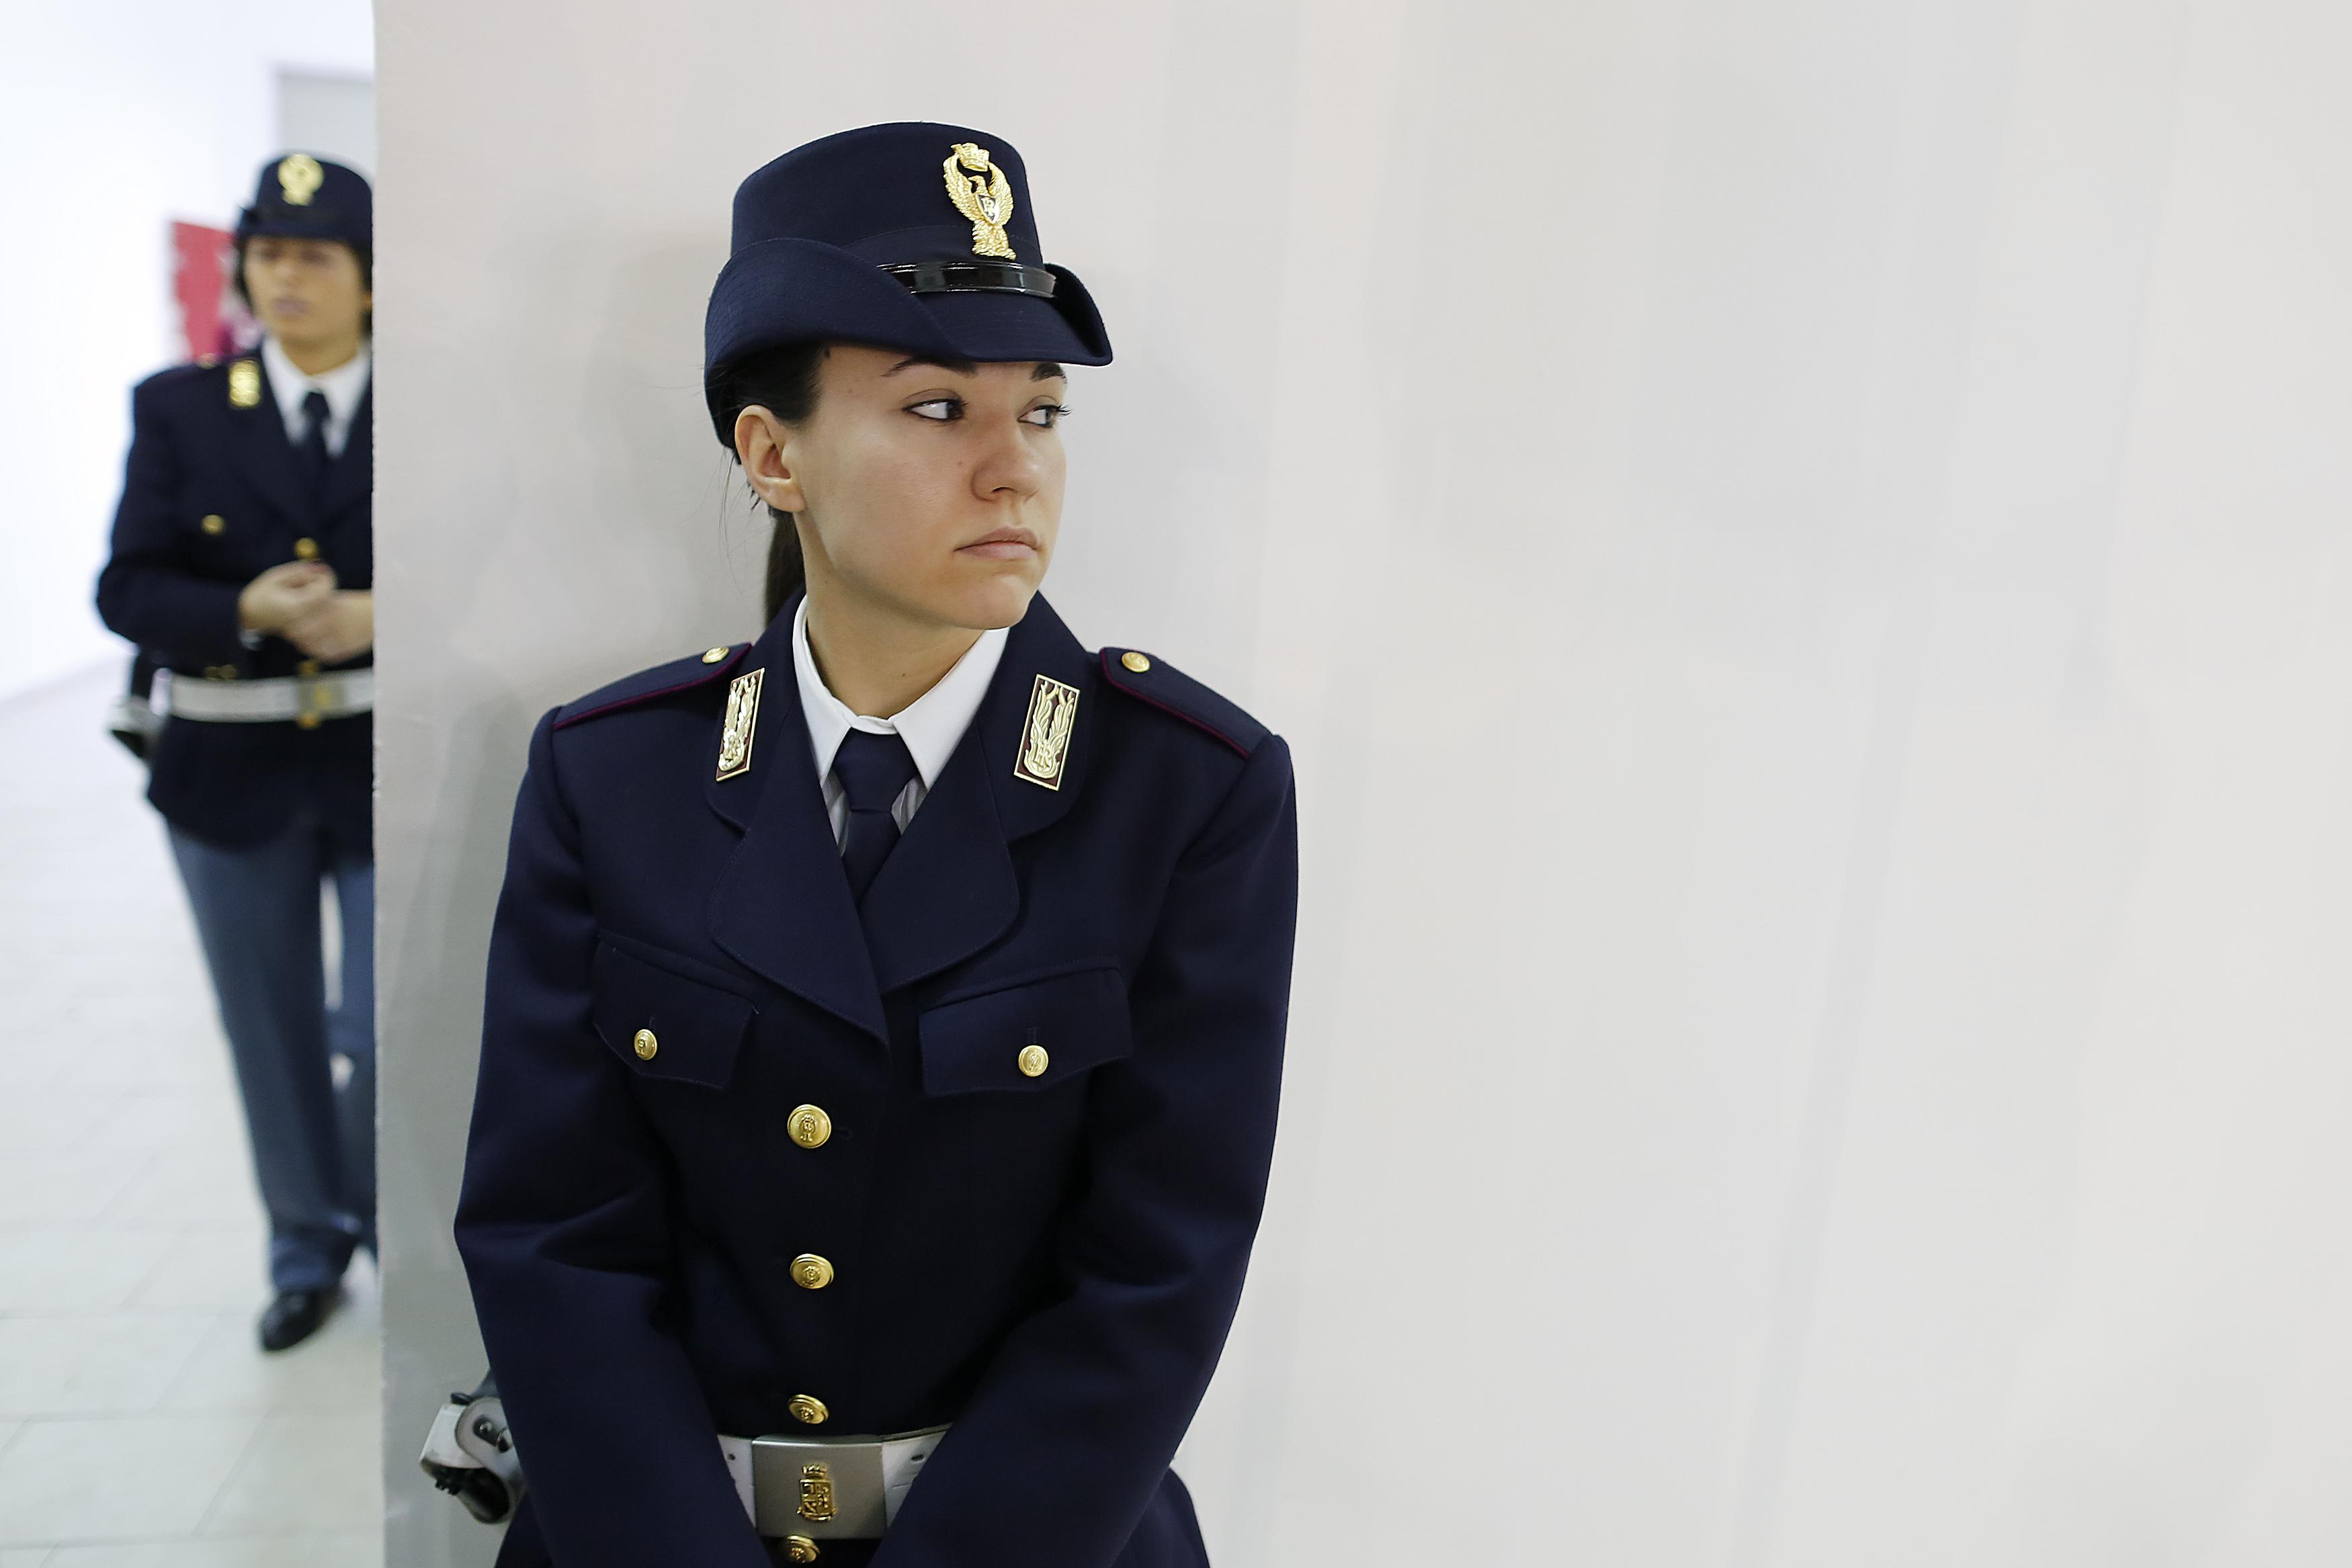 us spending millions to train women police officers worldwide